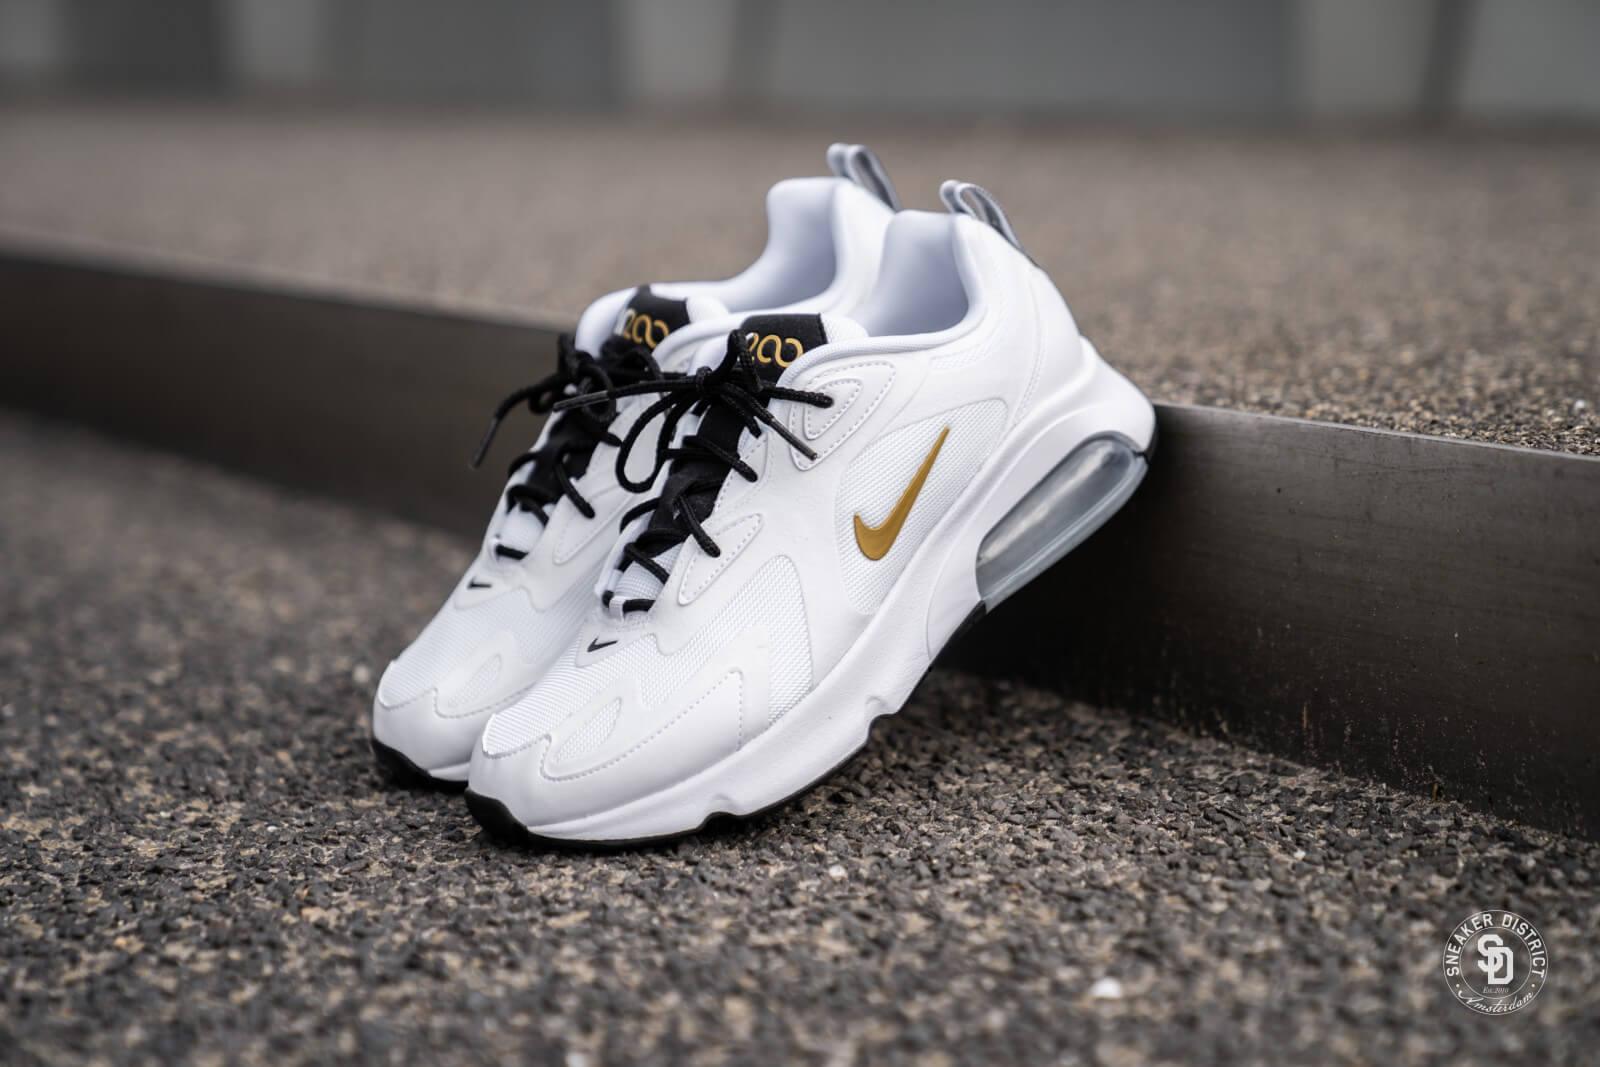 Nike Air Max 200 White/Metallic Gold-Black